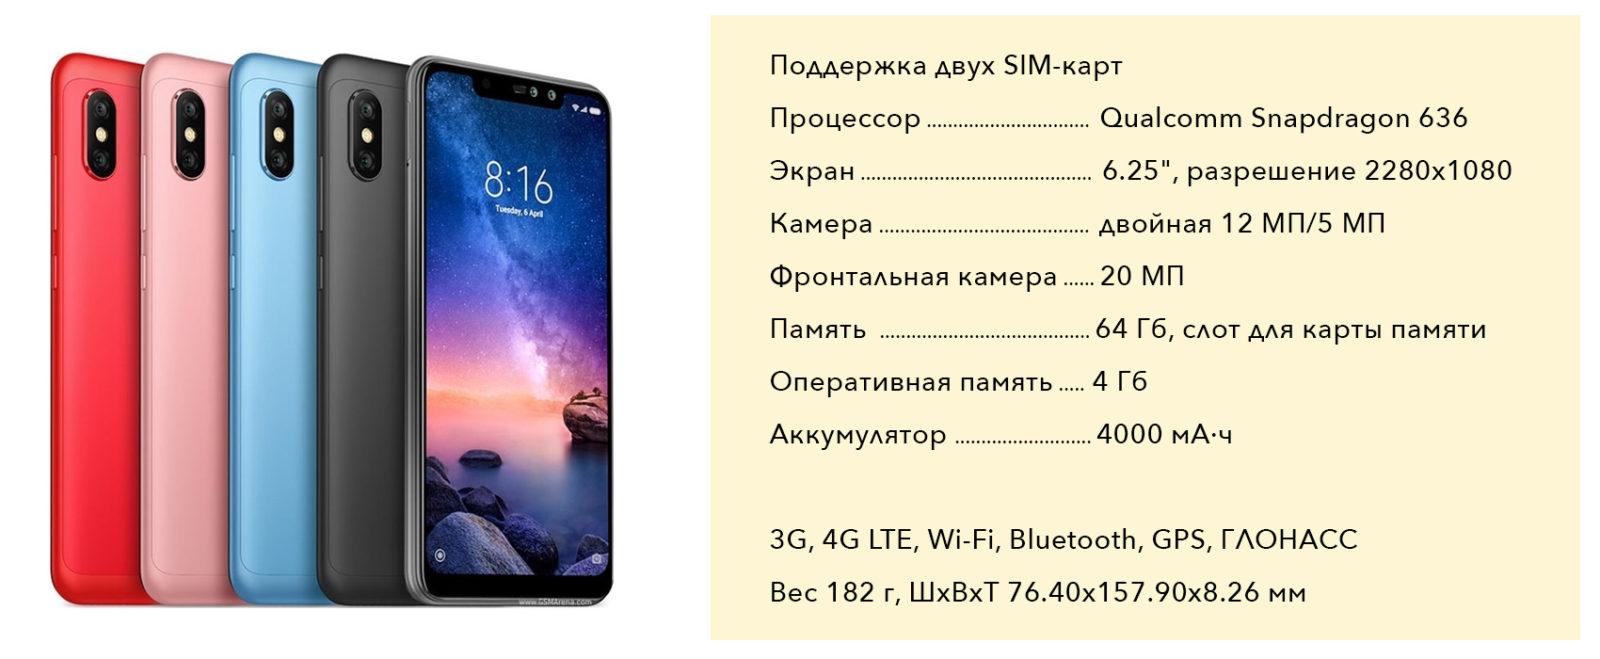 Характеристики Xiaomi Redmi Note 6 Pro